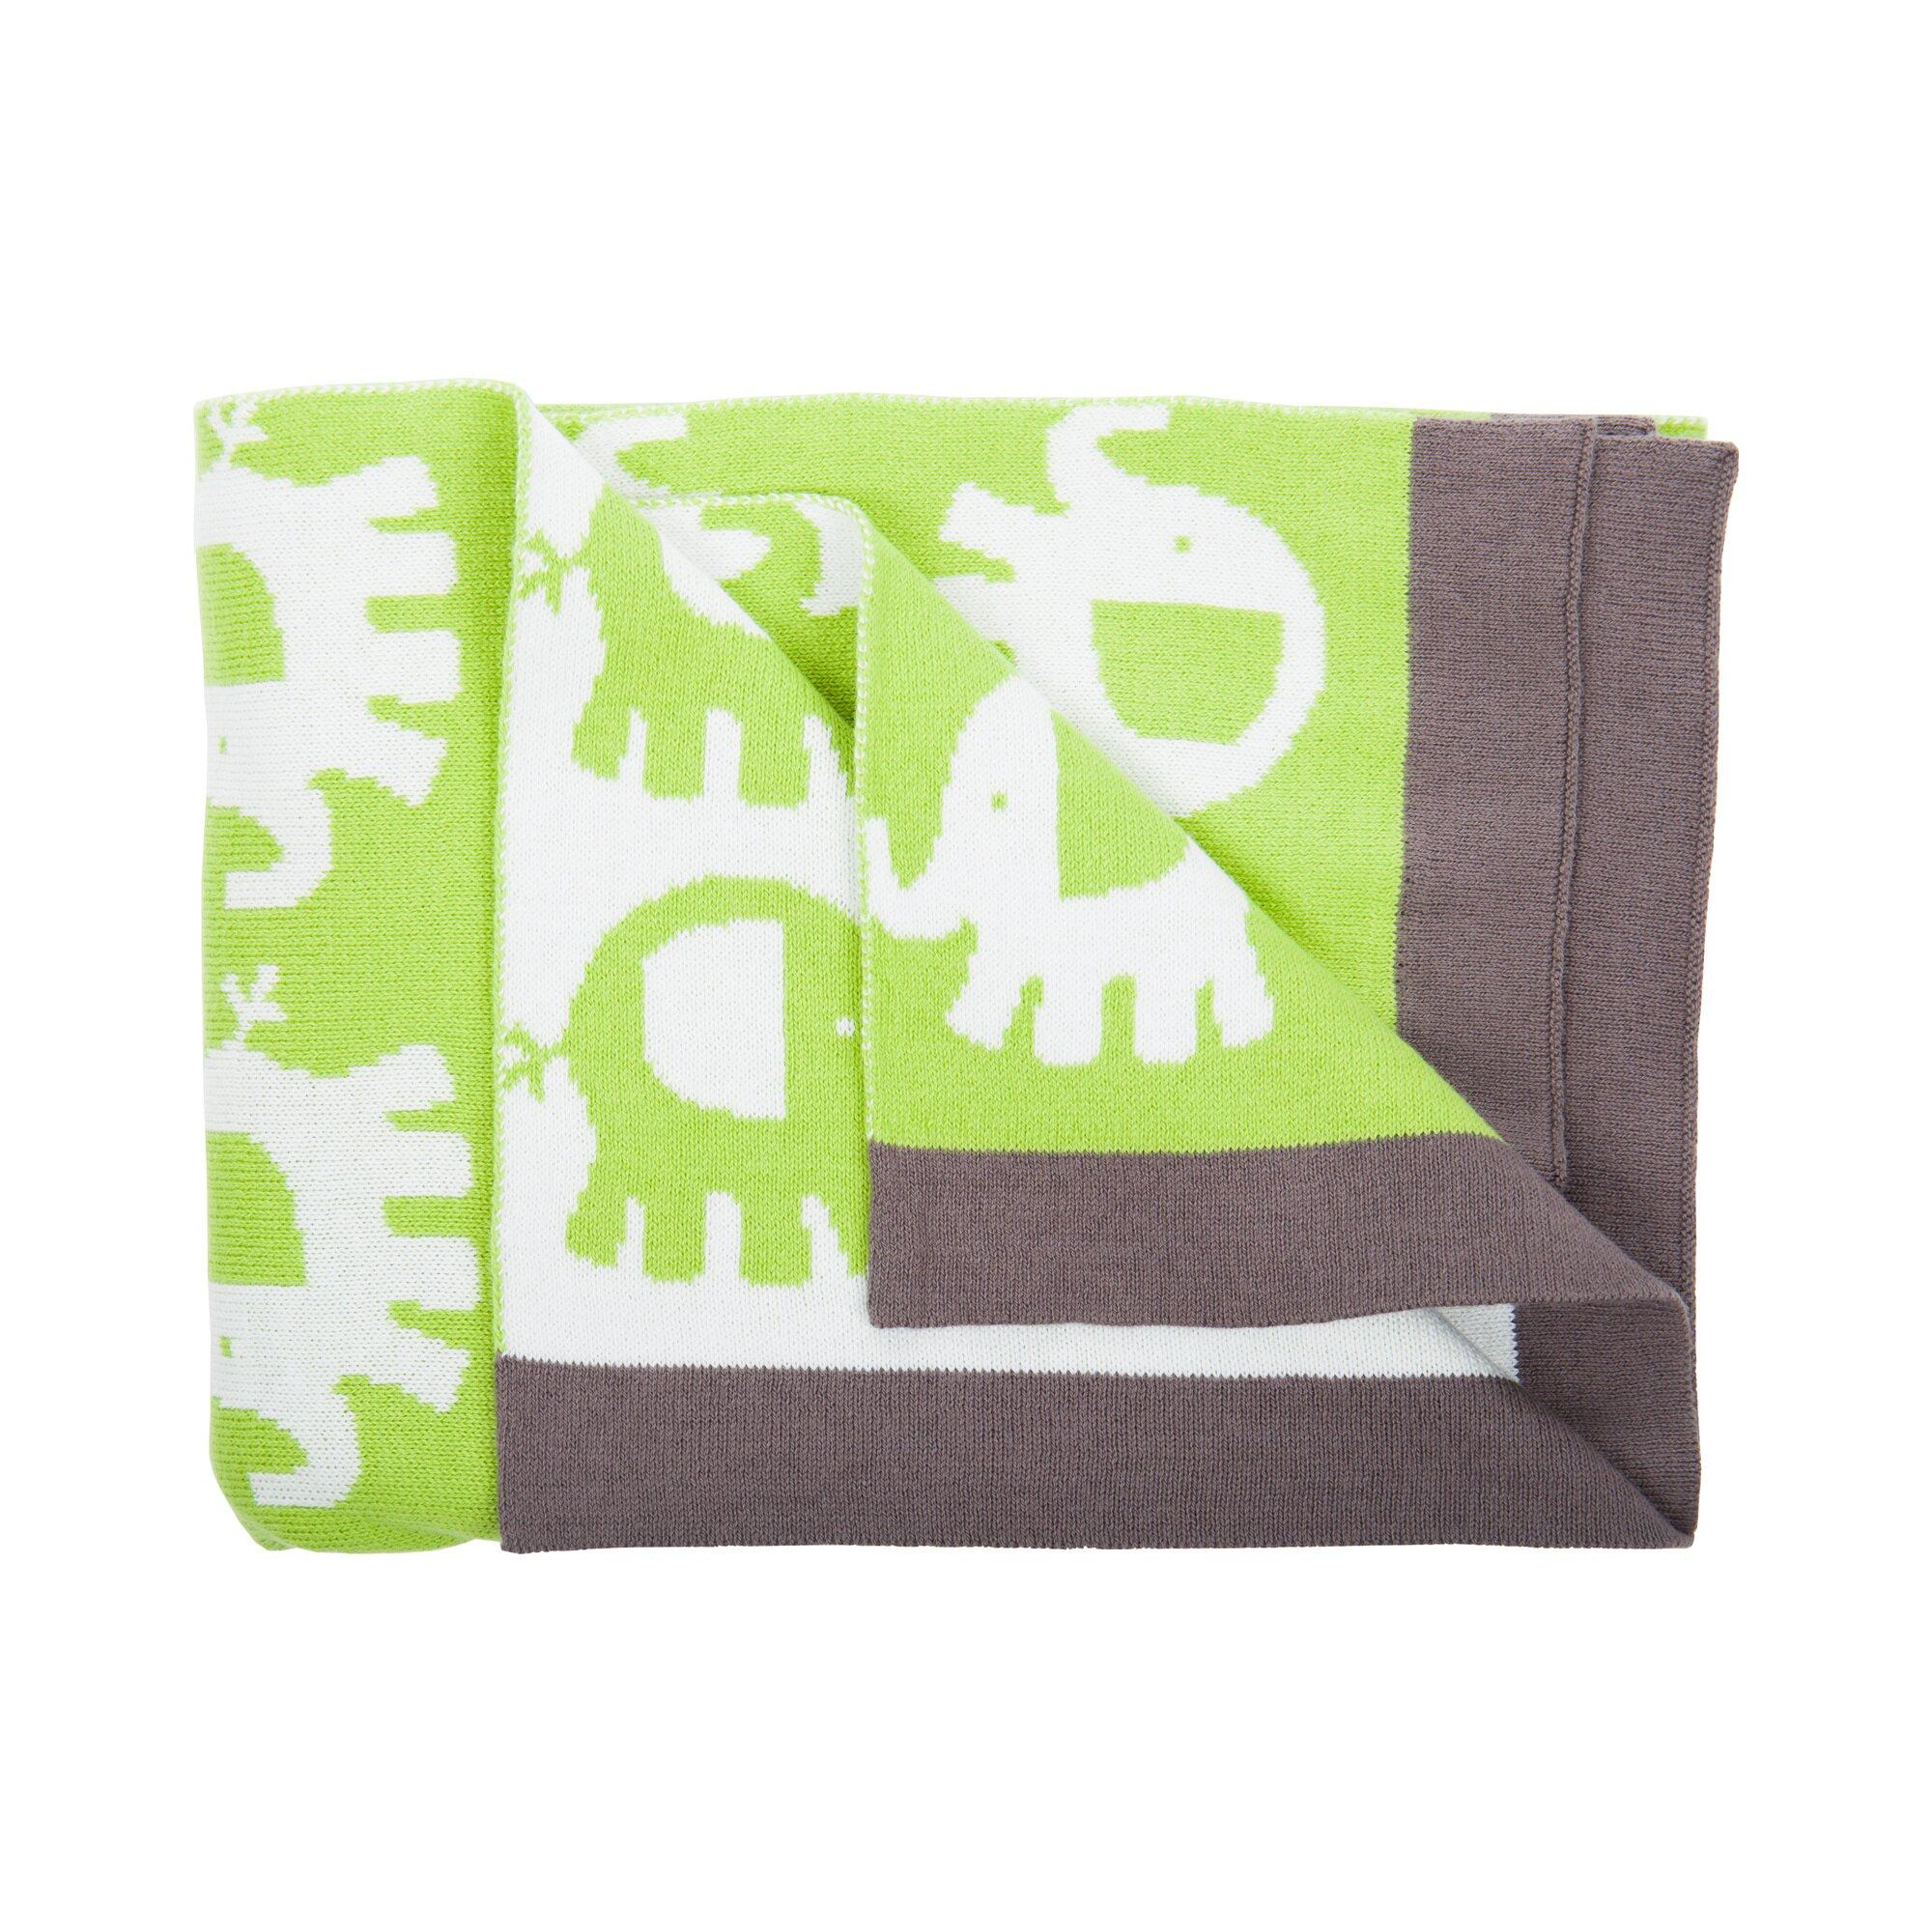 fillikid-babydecke-elefant-75x100-cm-gruen